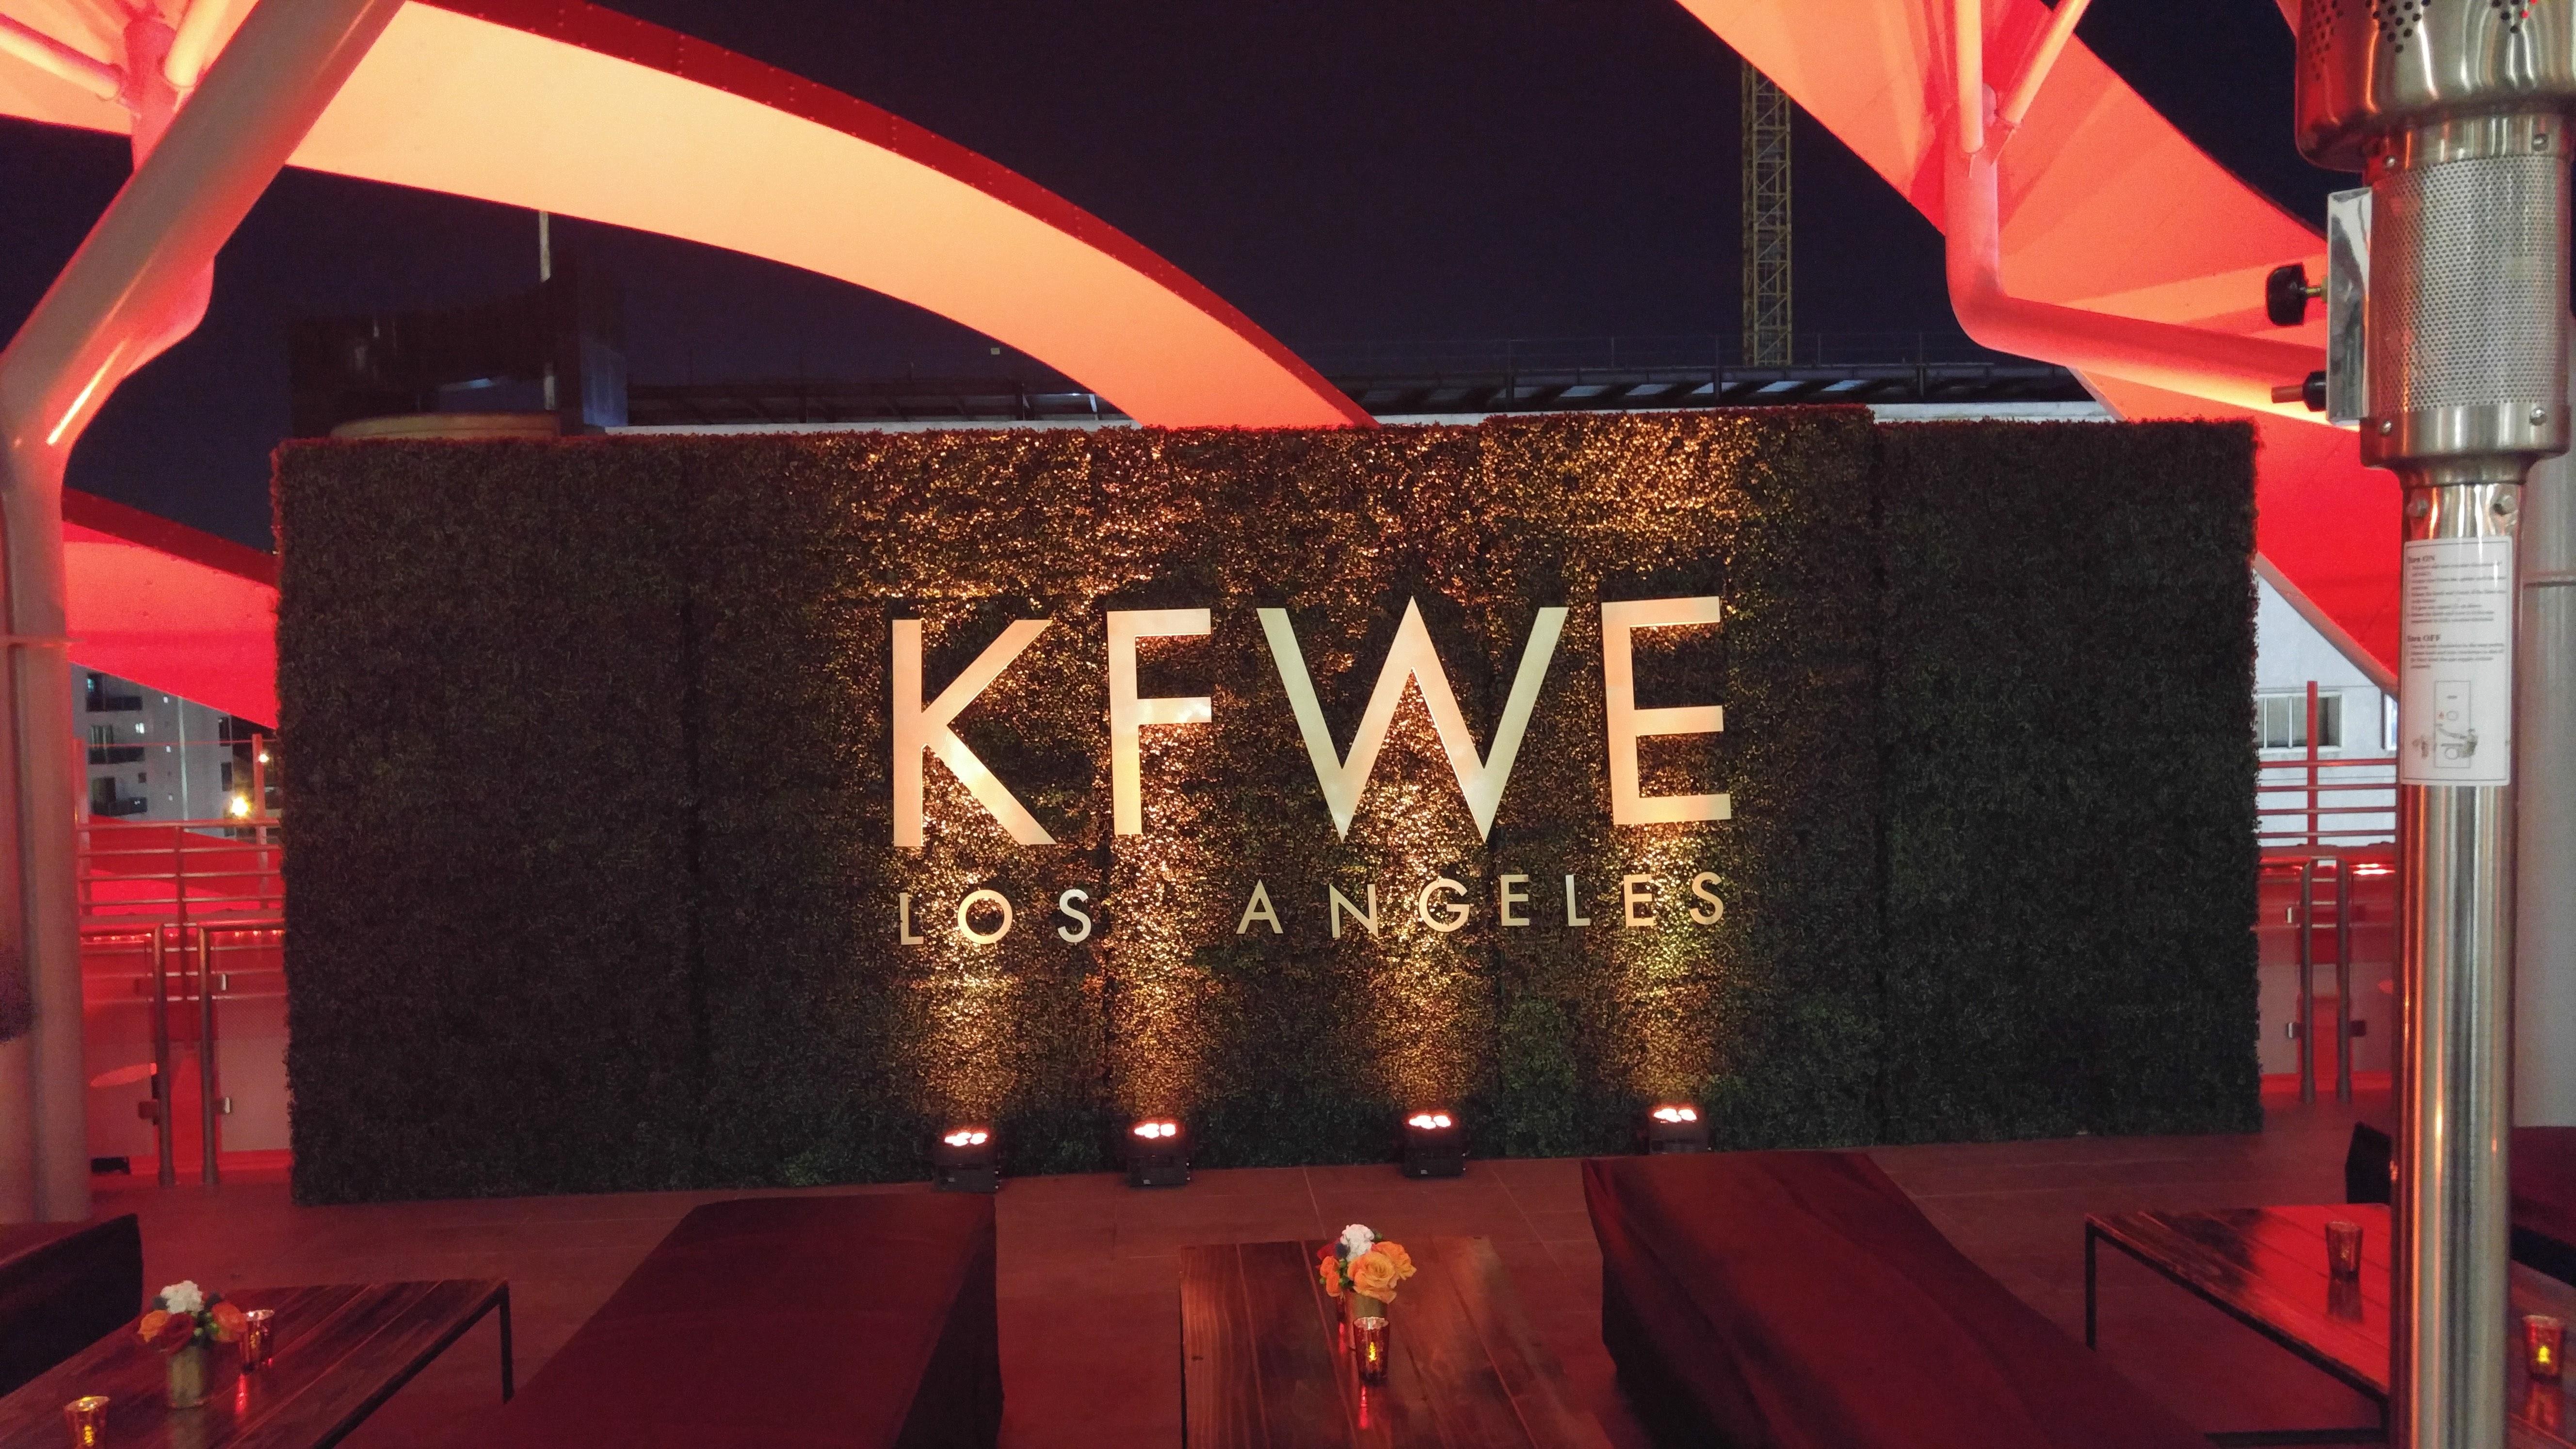 kfwe-los-angeles-sign